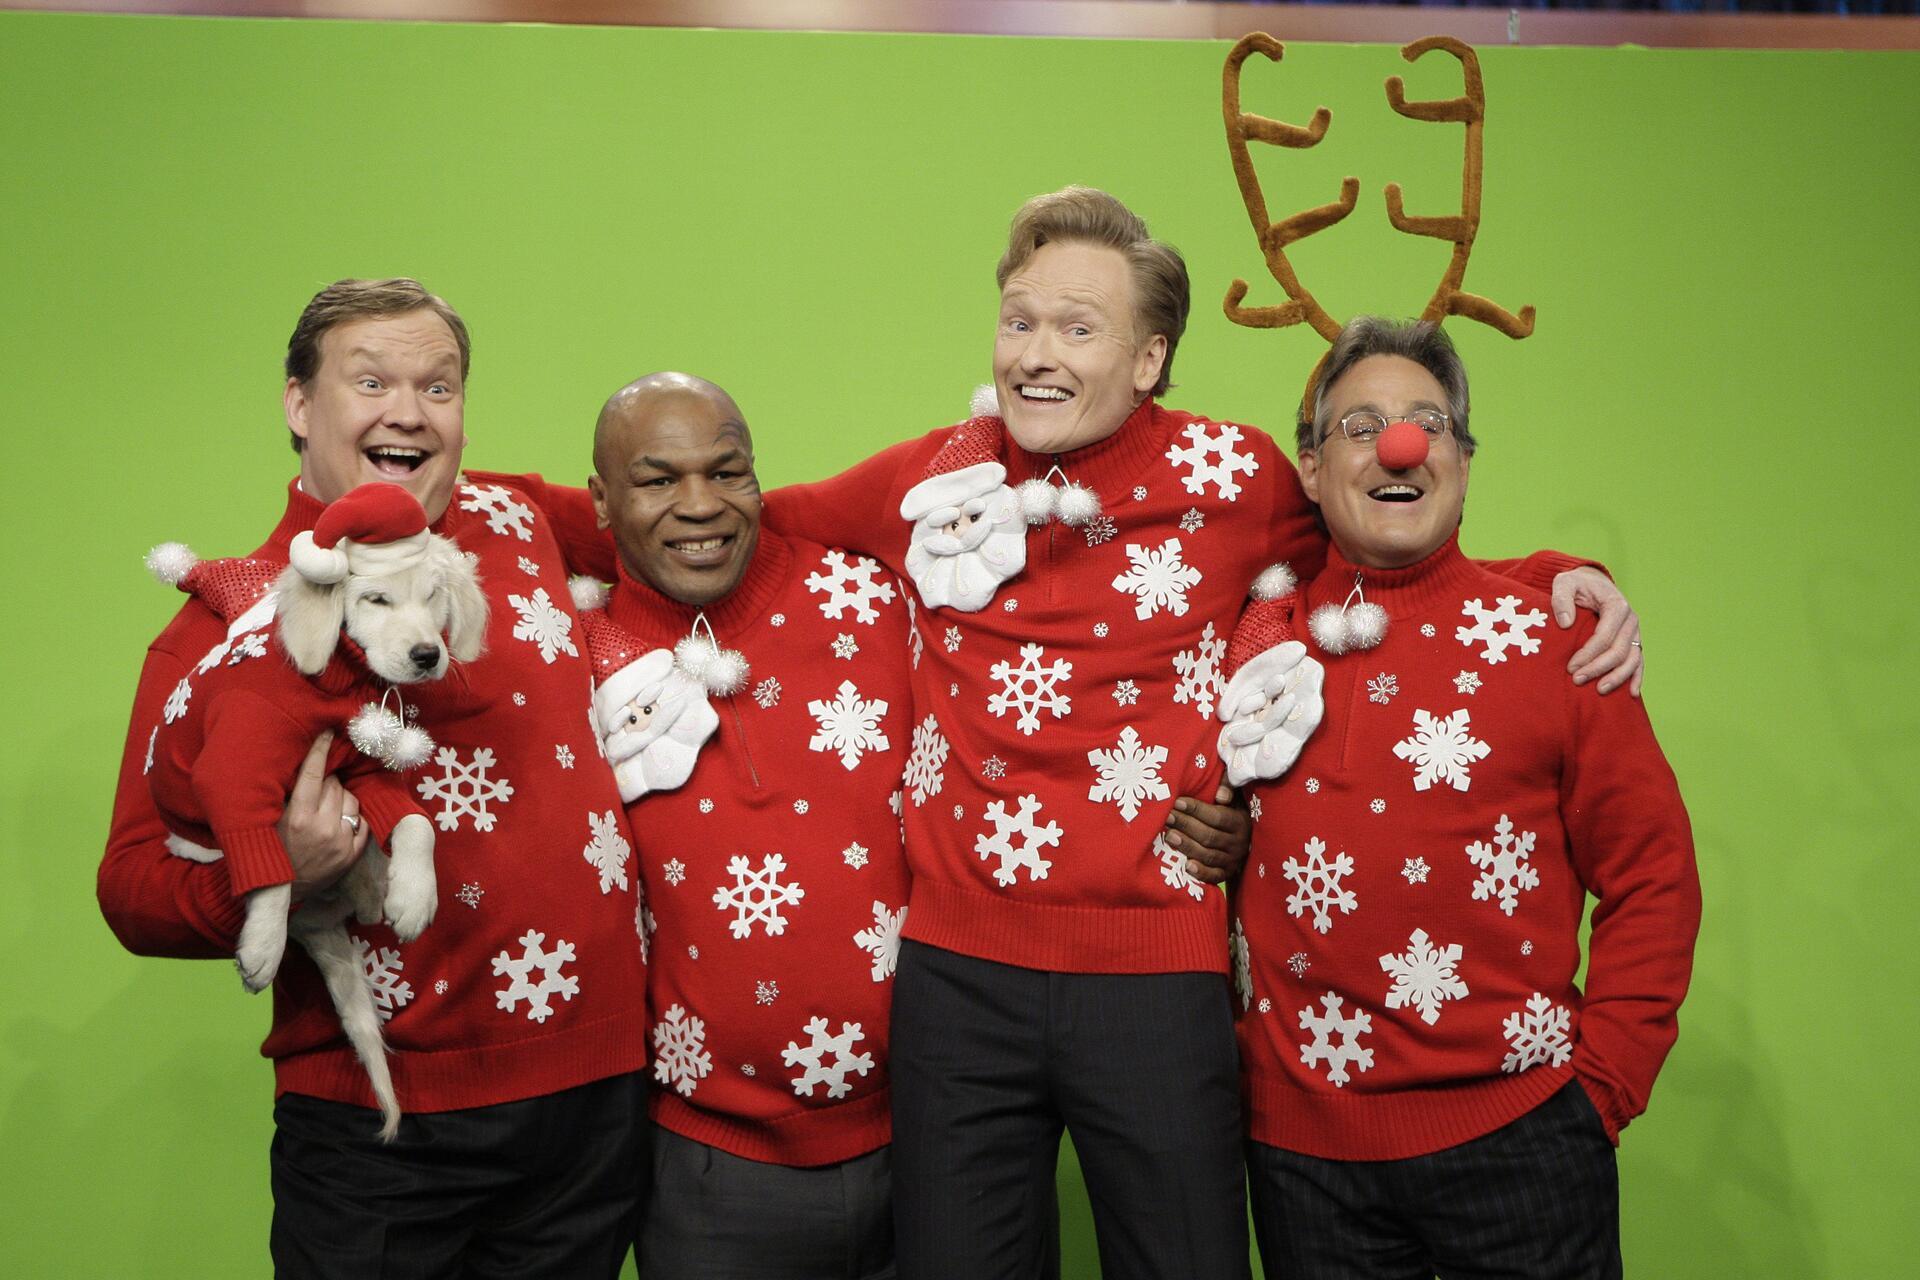 Bild zu Snuggles, Andy Richter, Mike Tyson, Conan O'Brien, Weihnachten, Ugly Sweater